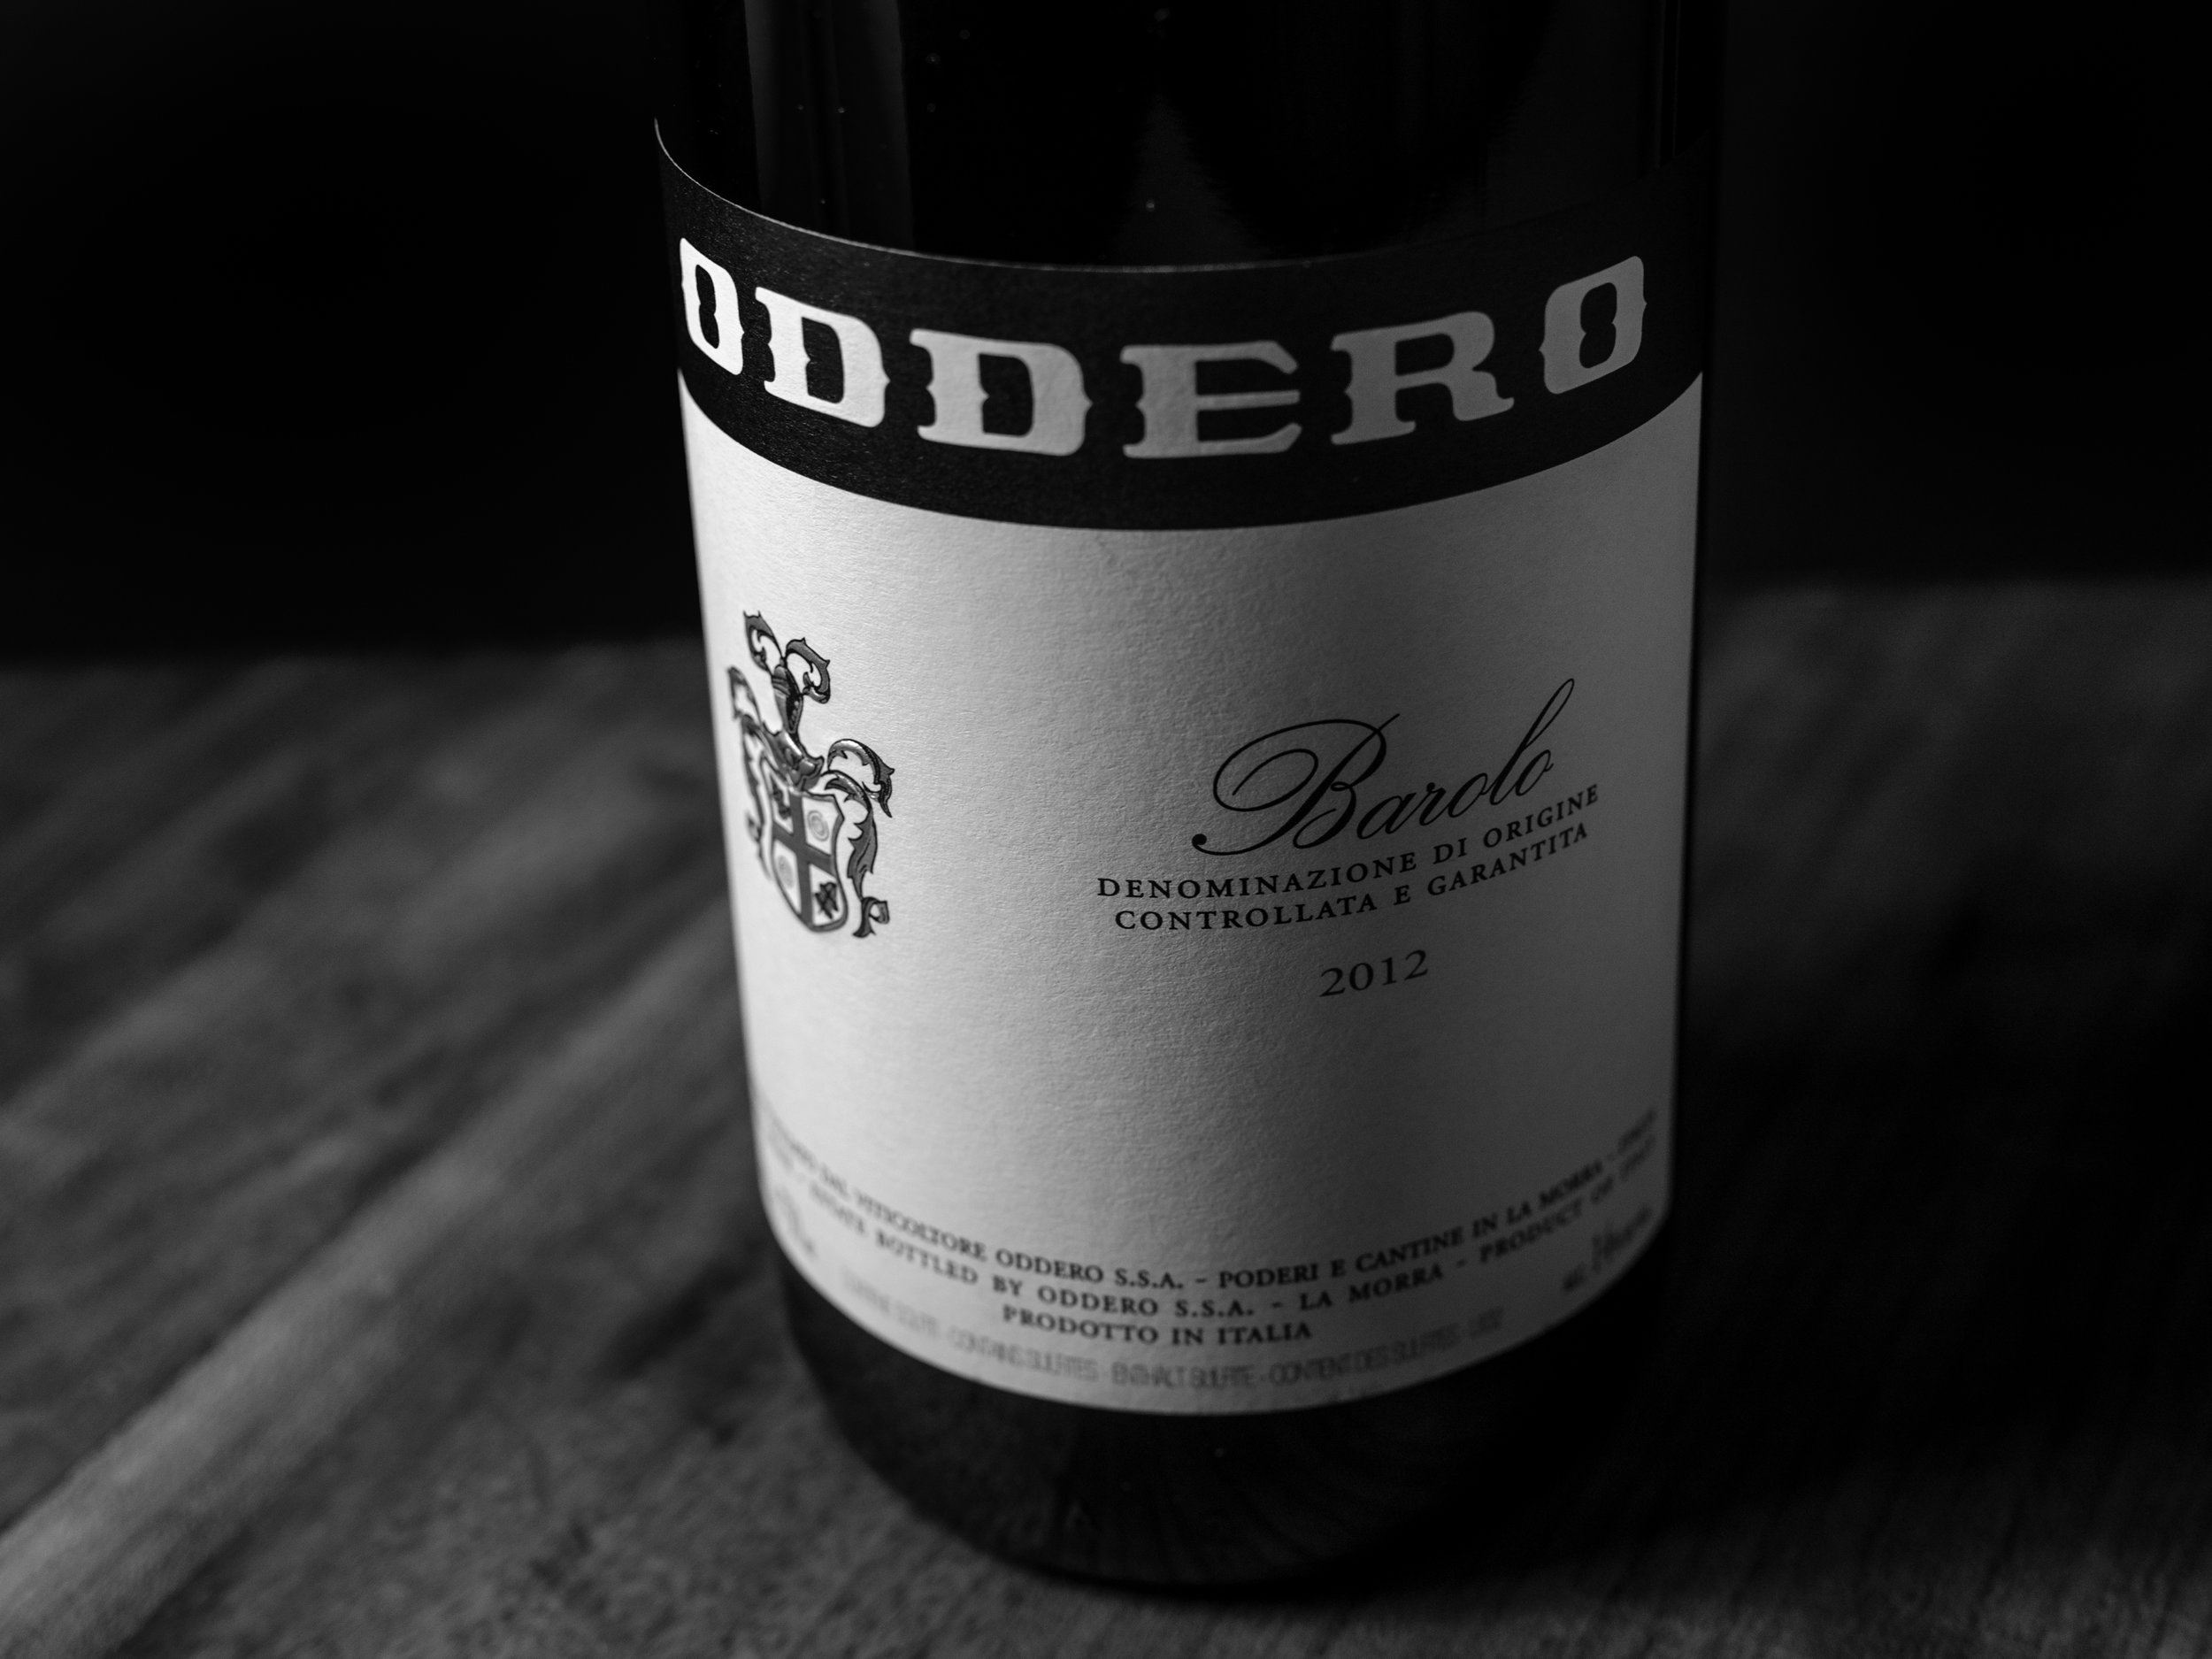 Musings by the Glass - Vino Pairing Optimization - Oddero Black and White